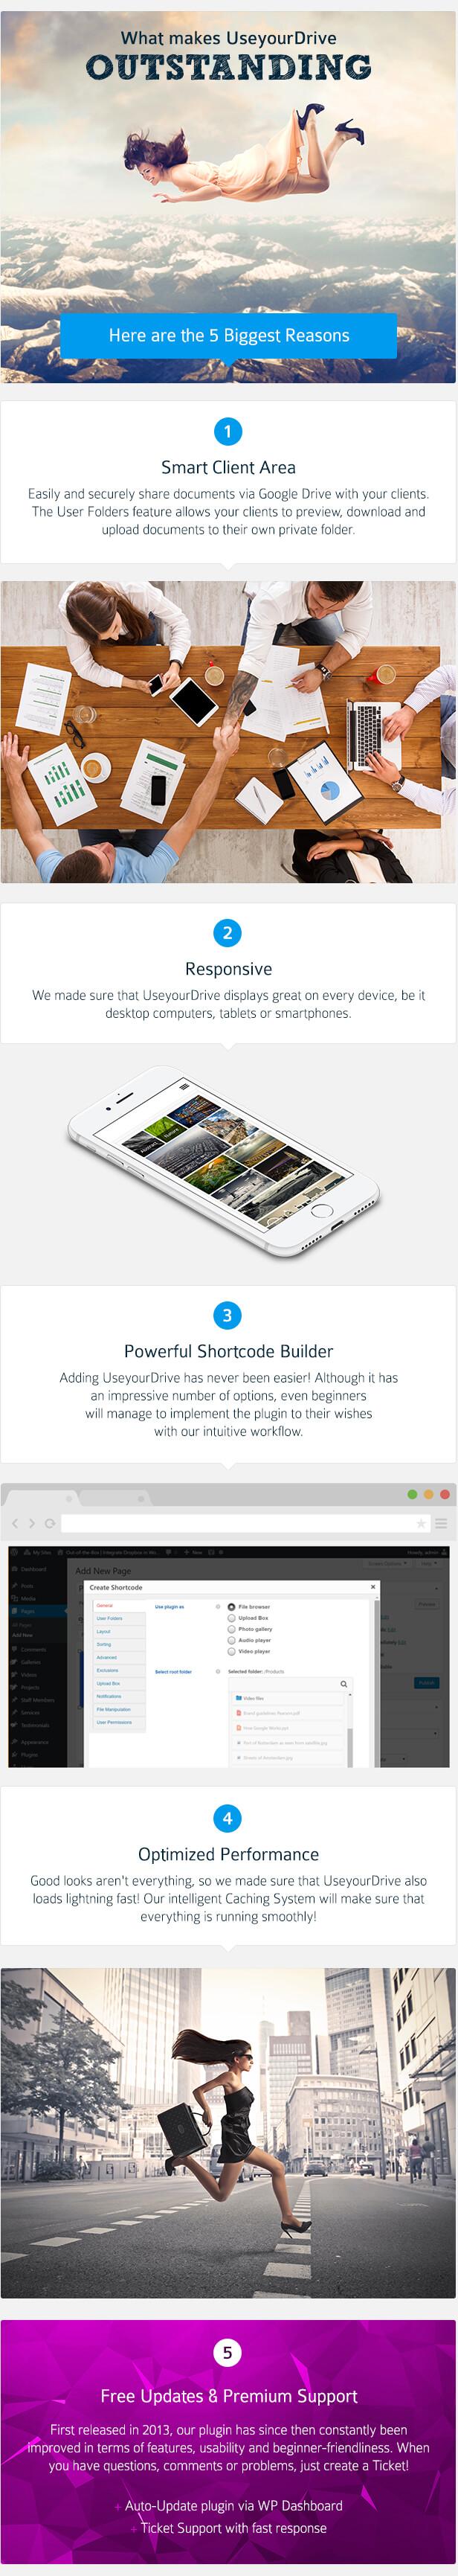 useyourdrive6 - Use-your-Drive | Google Drive plugin for WordPress